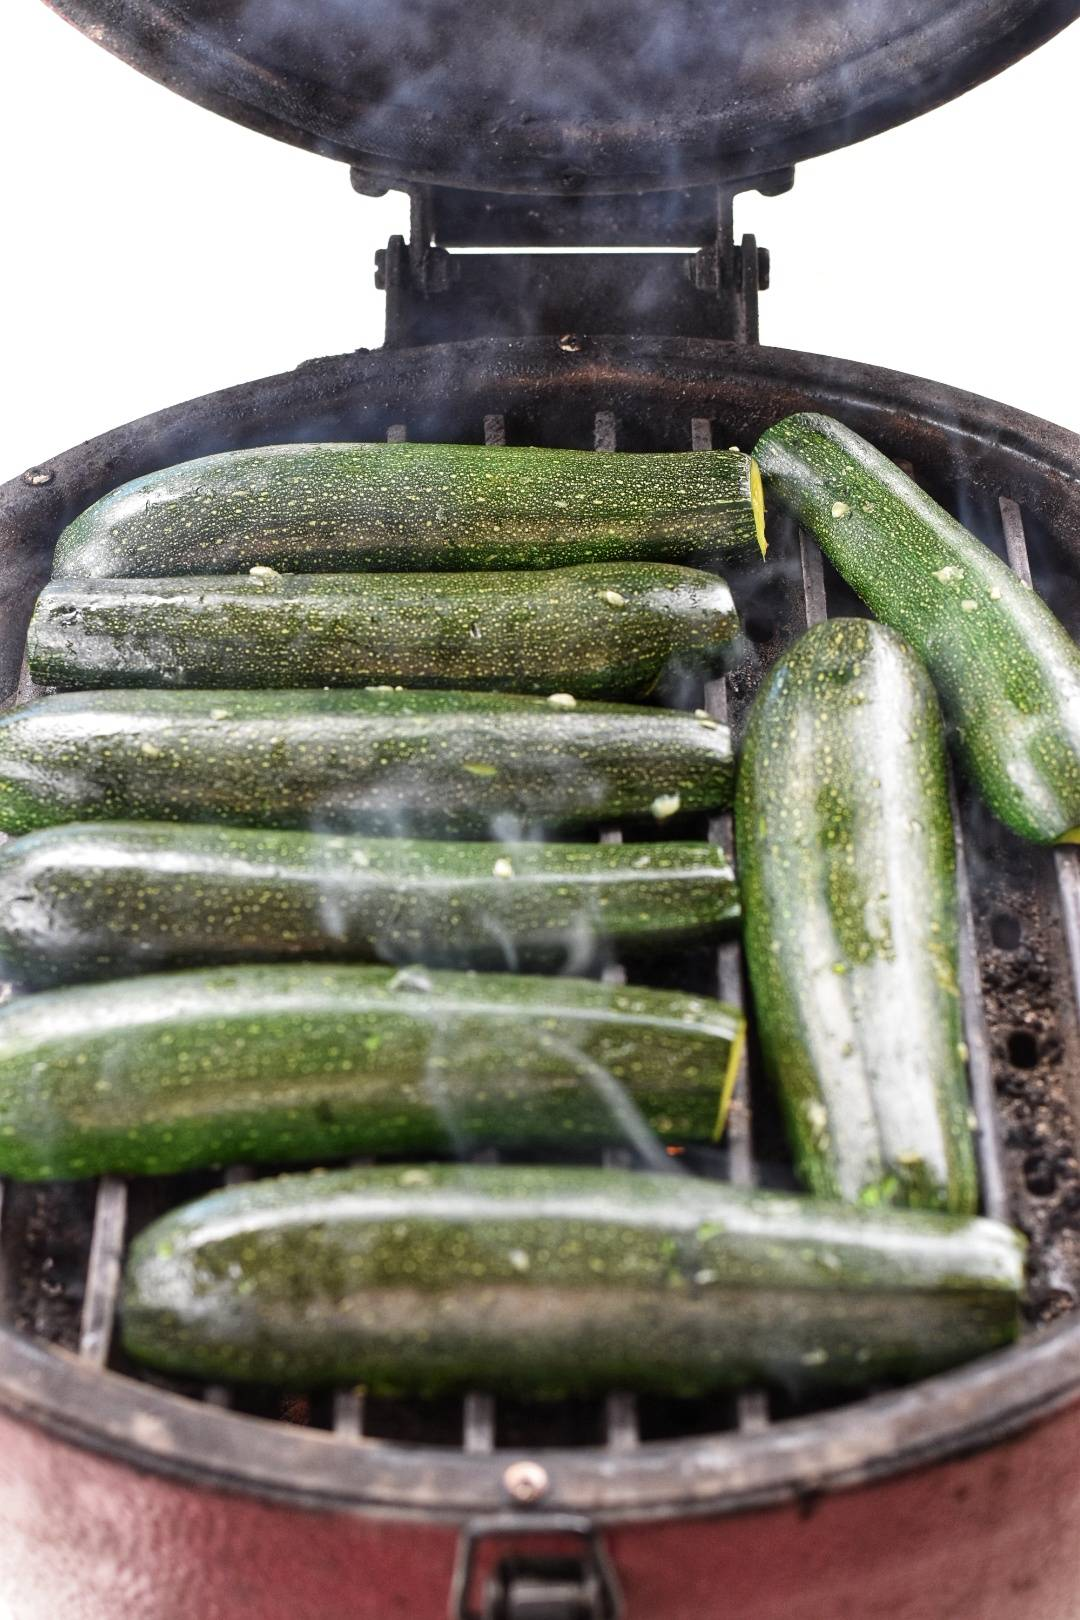 Zucchini boats on grill